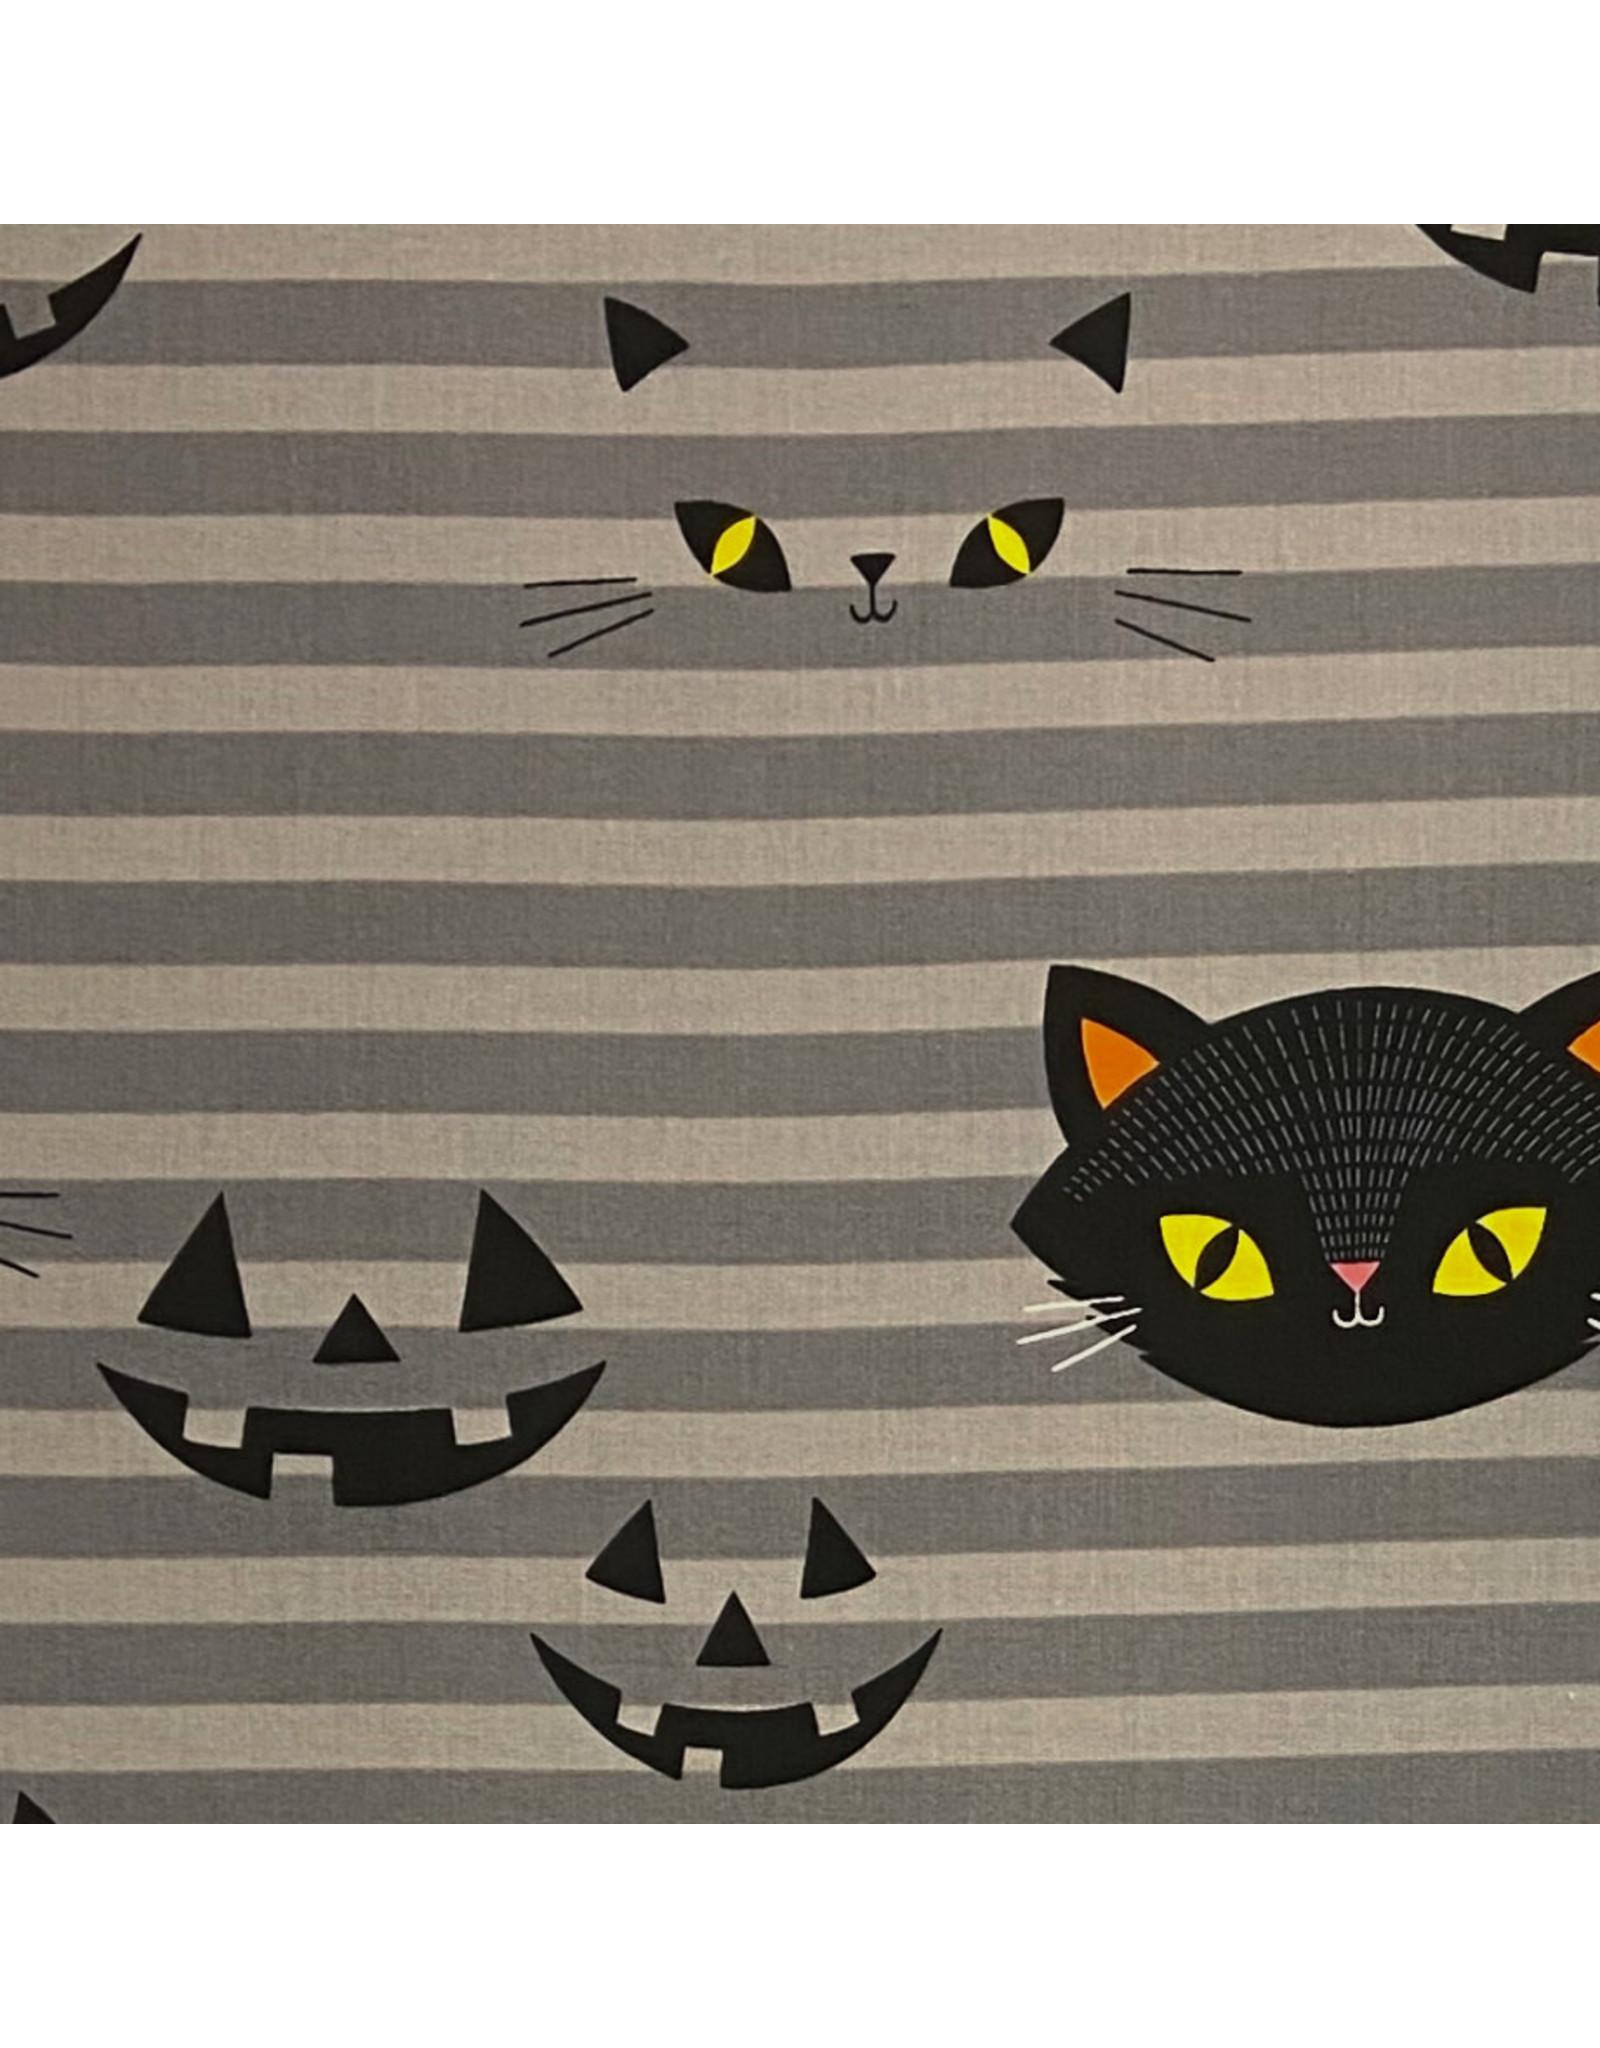 Alexander Henry Fabrics Haunted House, Hide-N-Go Kitty in Smoke, Fabric Half-Yards